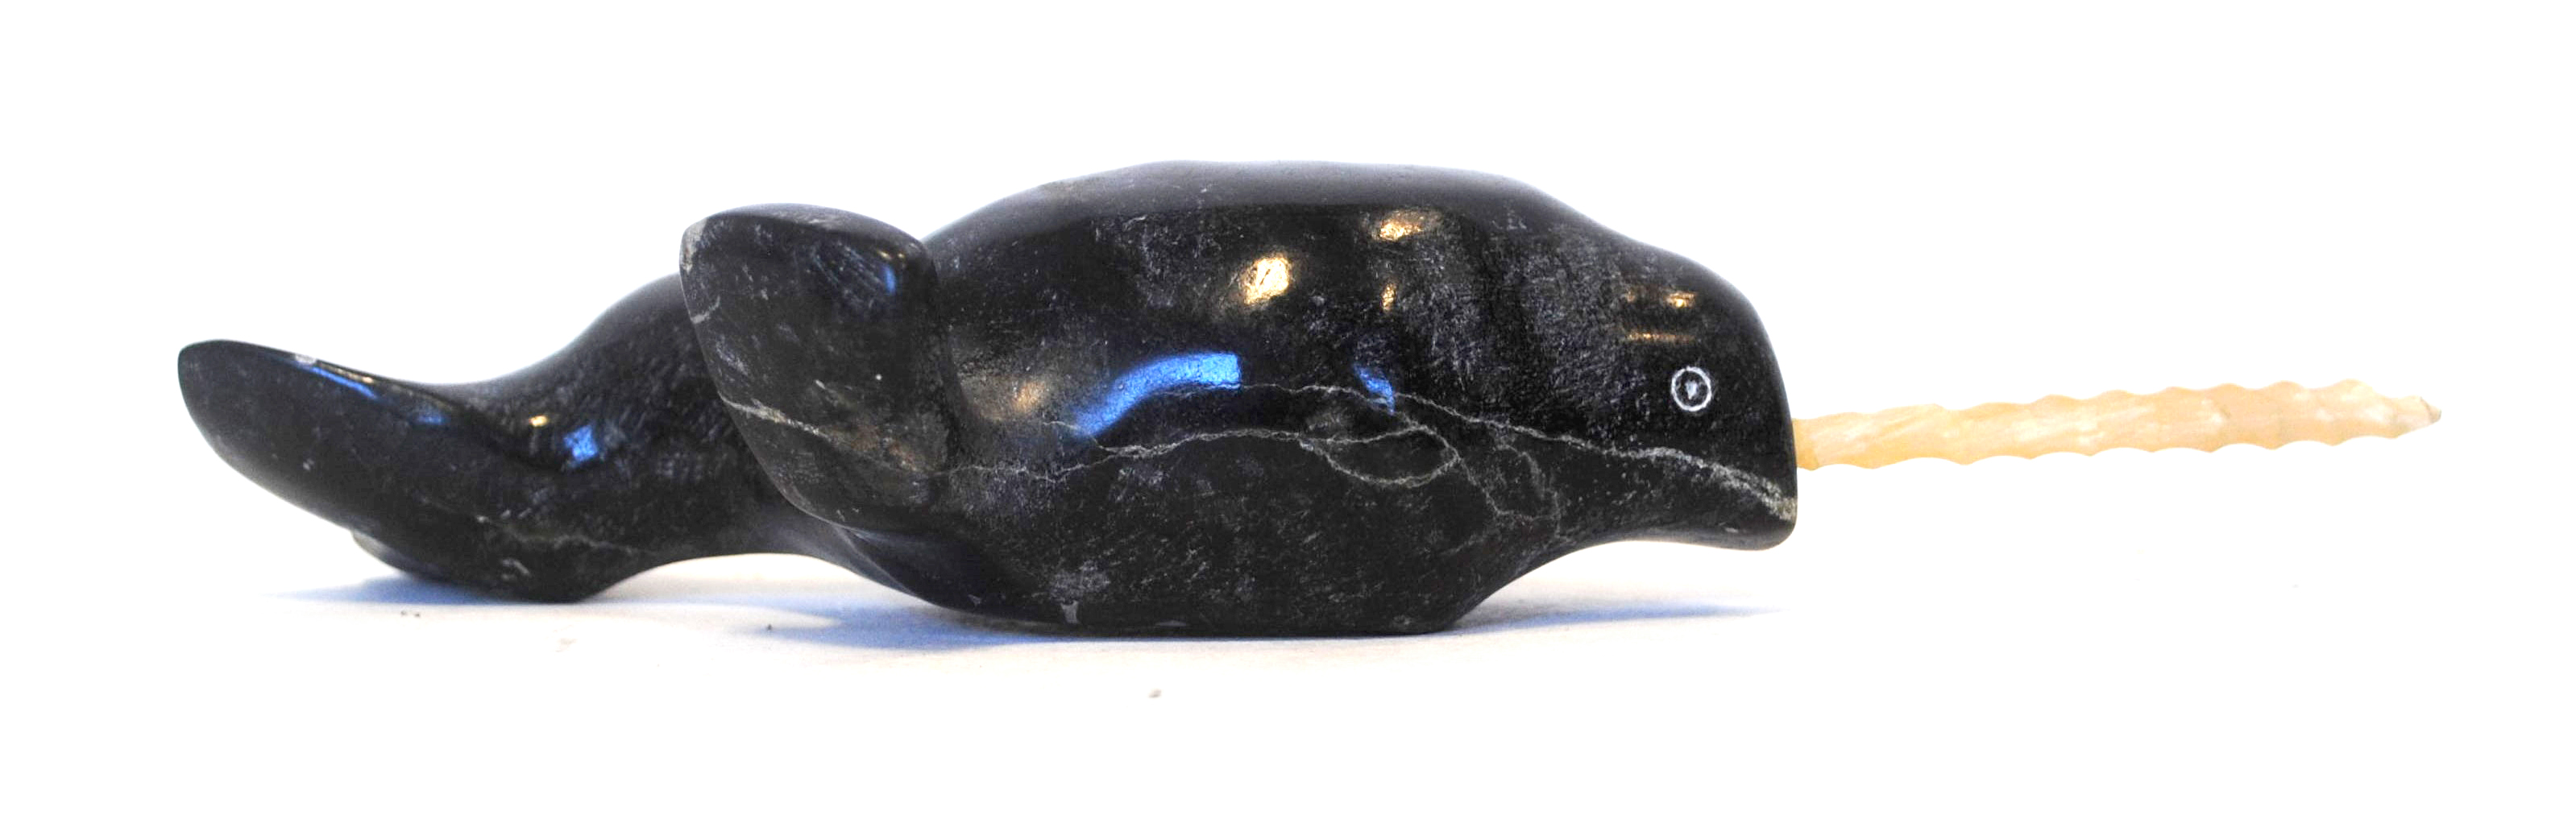 "David Kingatook's ""Norwhale"" Sculpture"